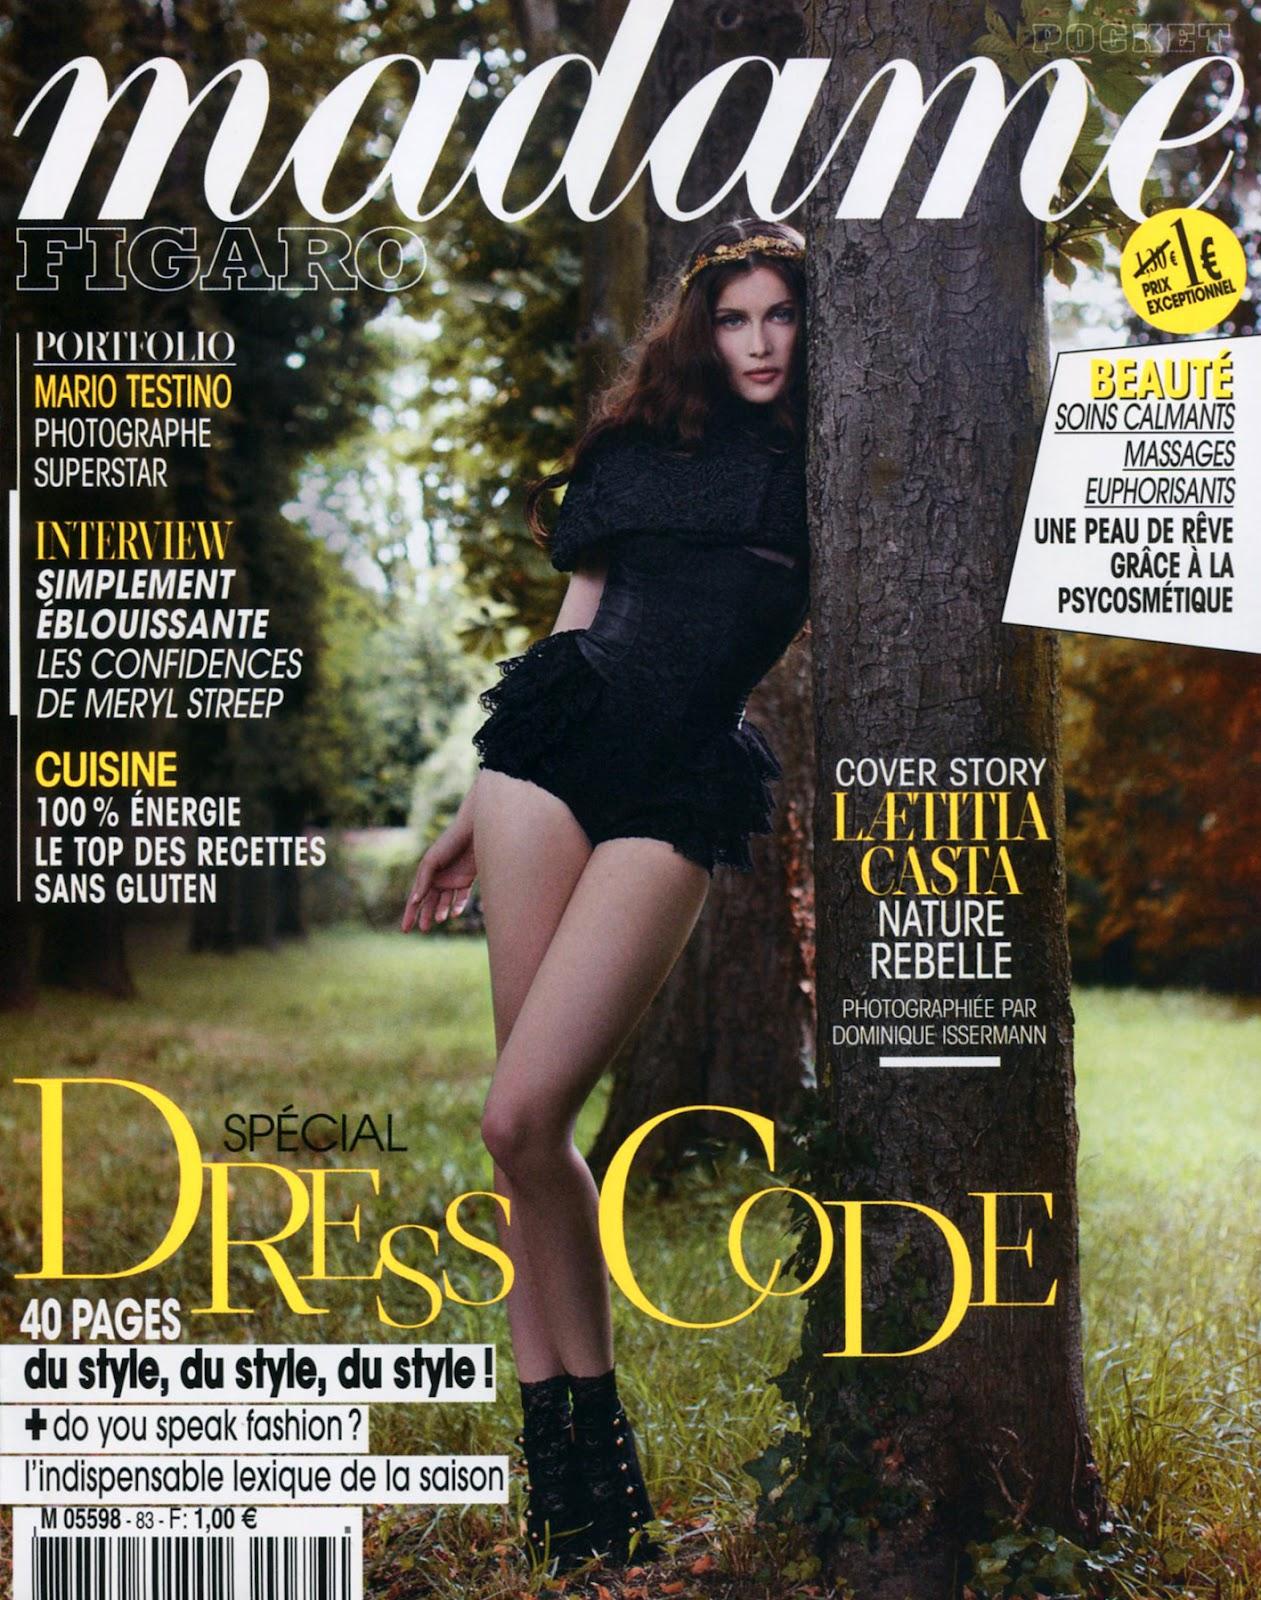 http://4.bp.blogspot.com/-KCsZOTSb1PU/UGnHcNiyI5I/AAAAAAAAJ4k/3cmYWuMfwE4/s1600/2012+09+27th+Madame+Figaro+Fr+Ph+Dominique+Issermann+001.jpg